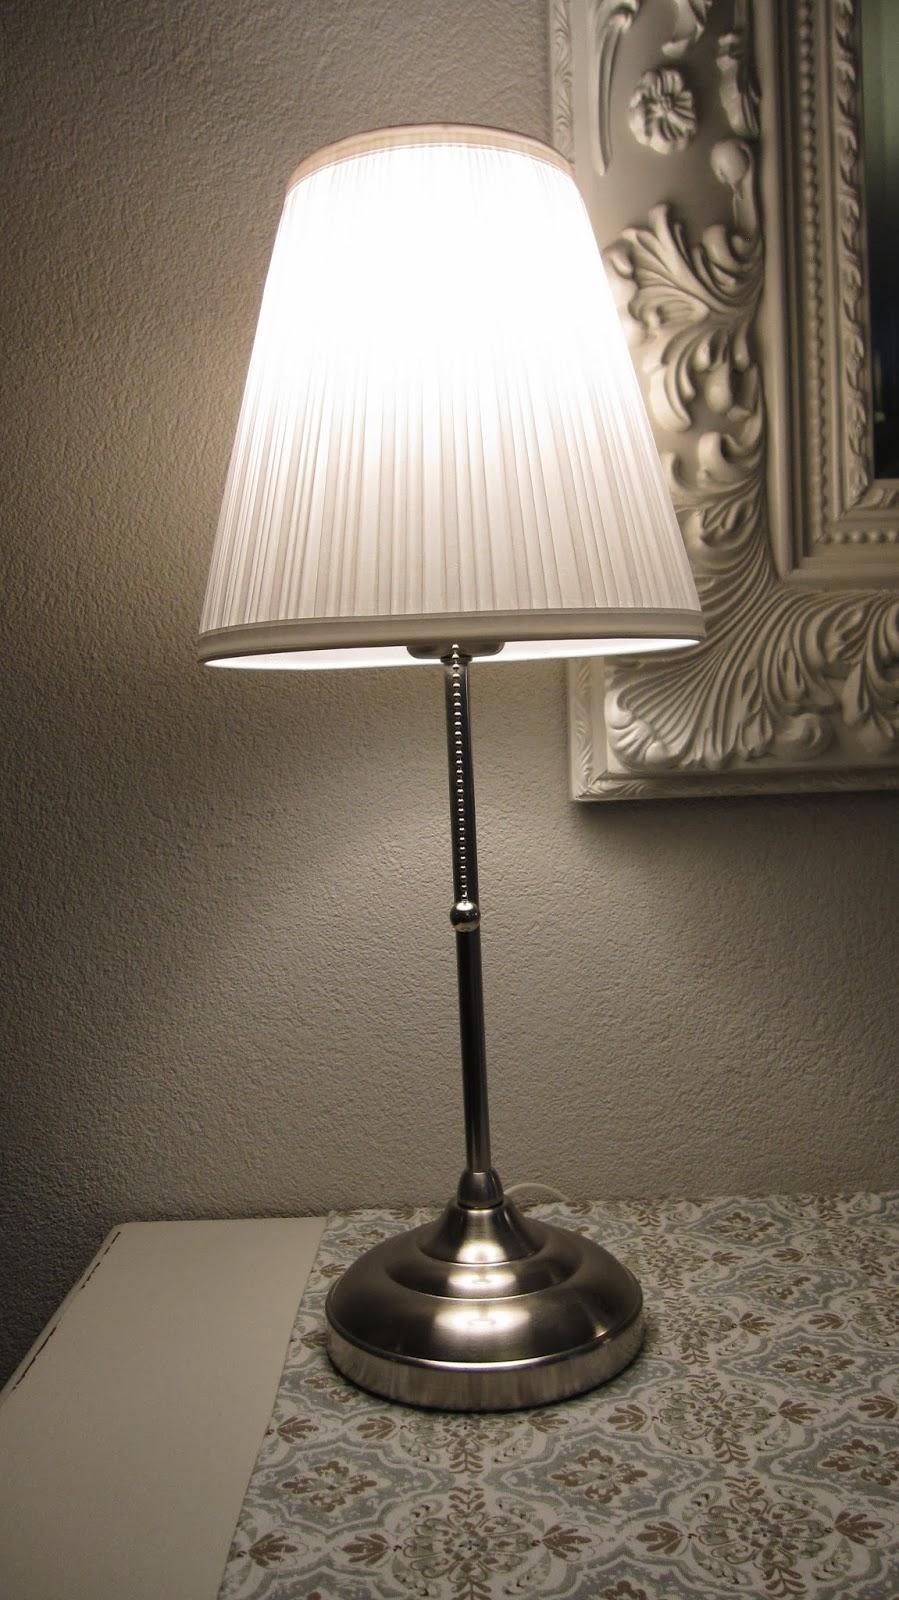 ikea wandleuchte arstid nernickelt wei schirm 16 cm d lampe wandlampe smash. Black Bedroom Furniture Sets. Home Design Ideas